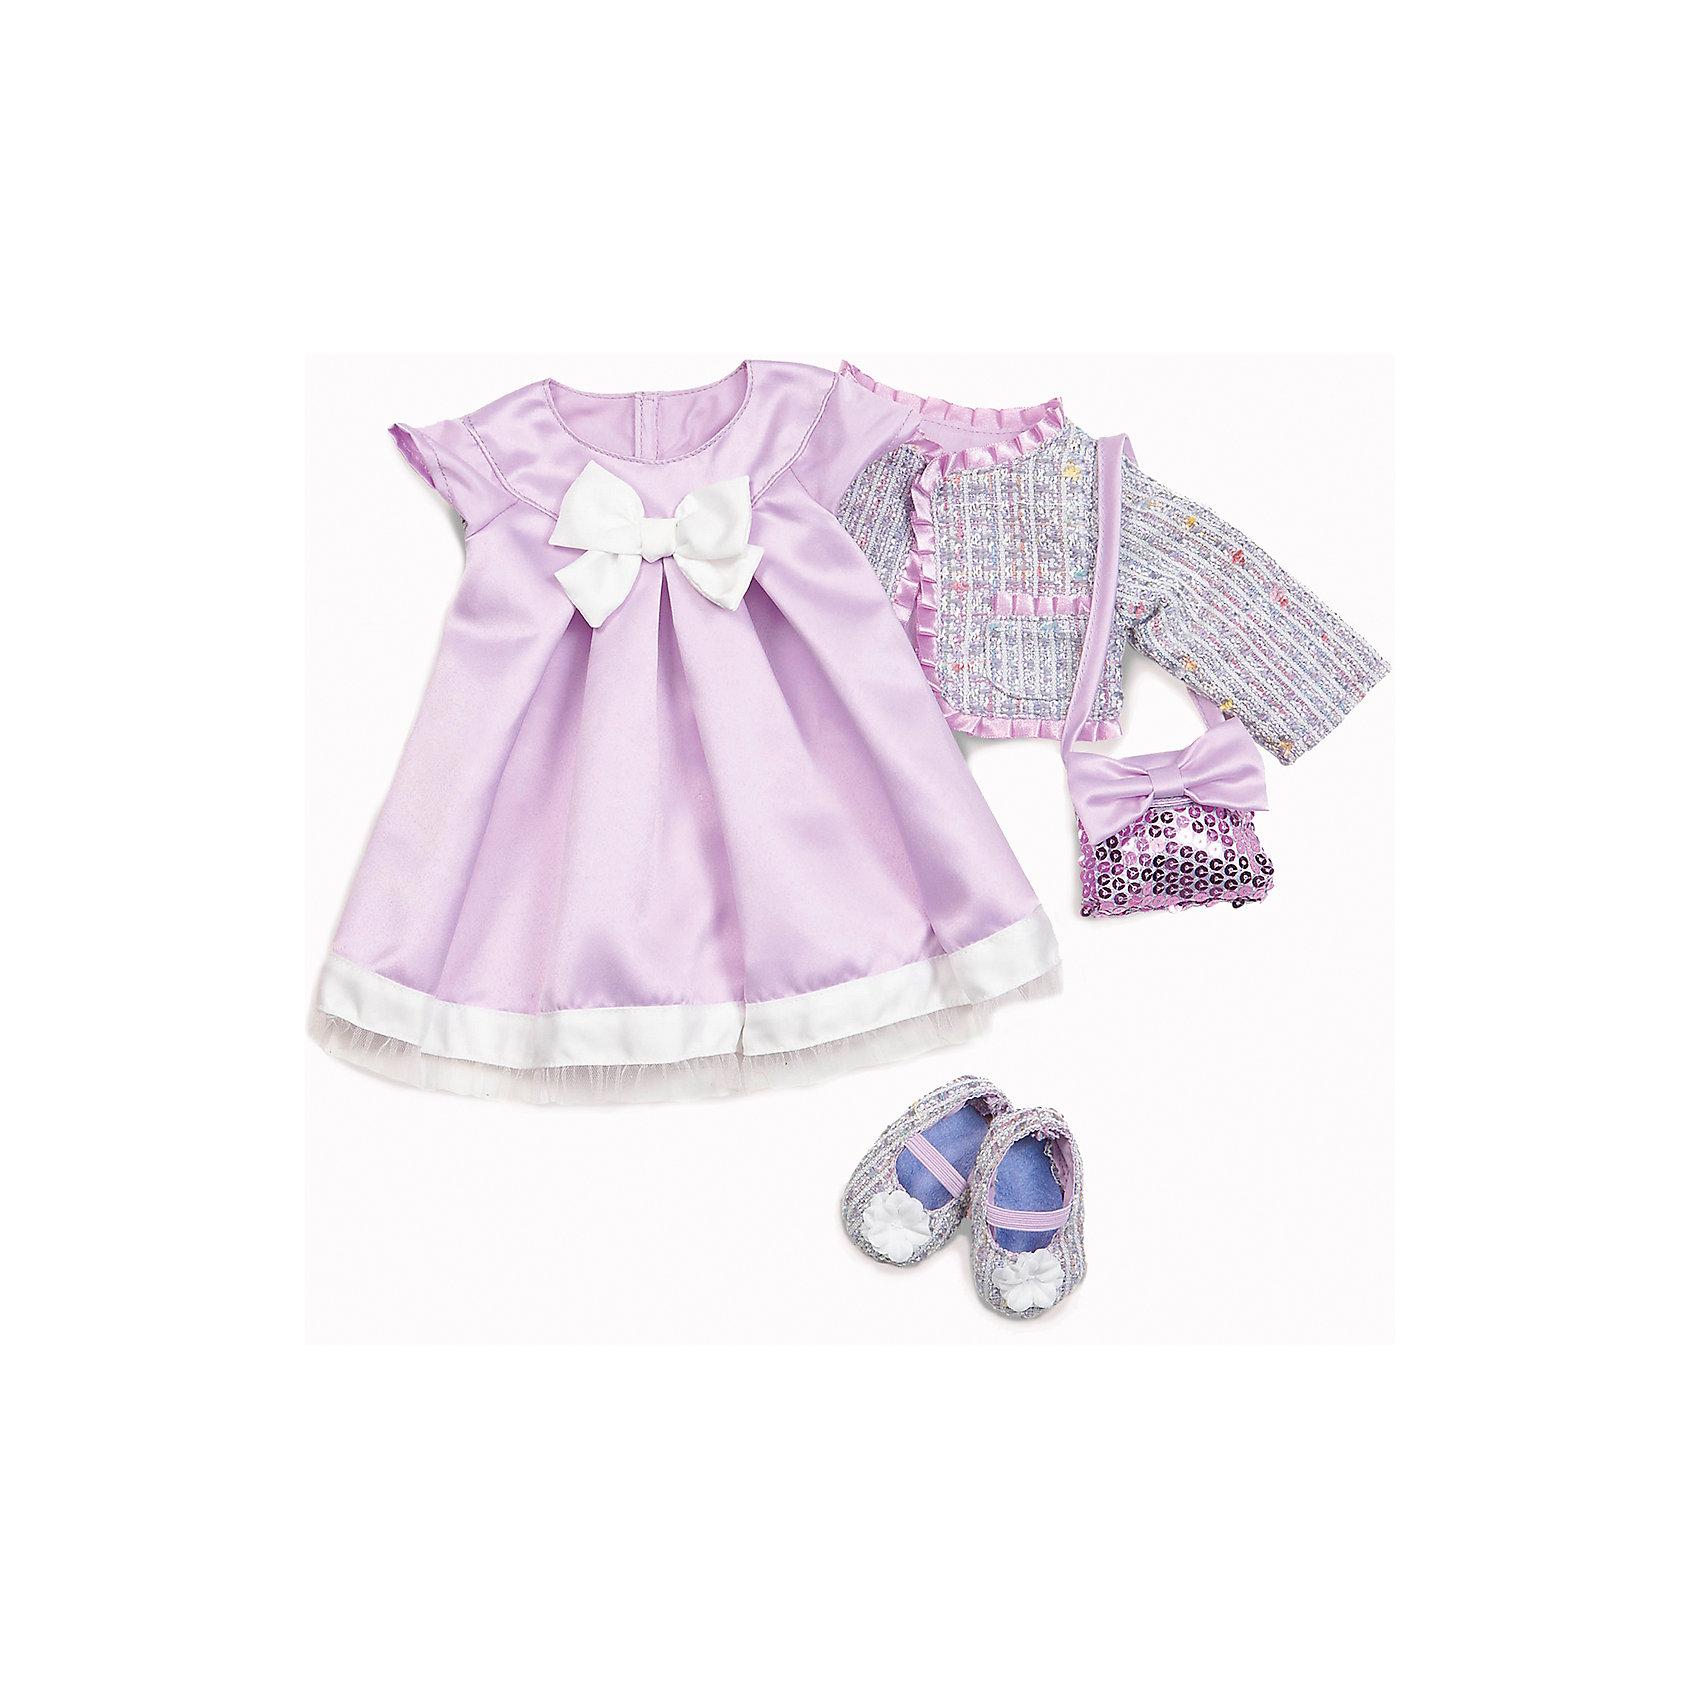 Our Generation Dolls Одежда делюкс для куклы, 46 см, Our Generation Dolls our generation переноска для куклы